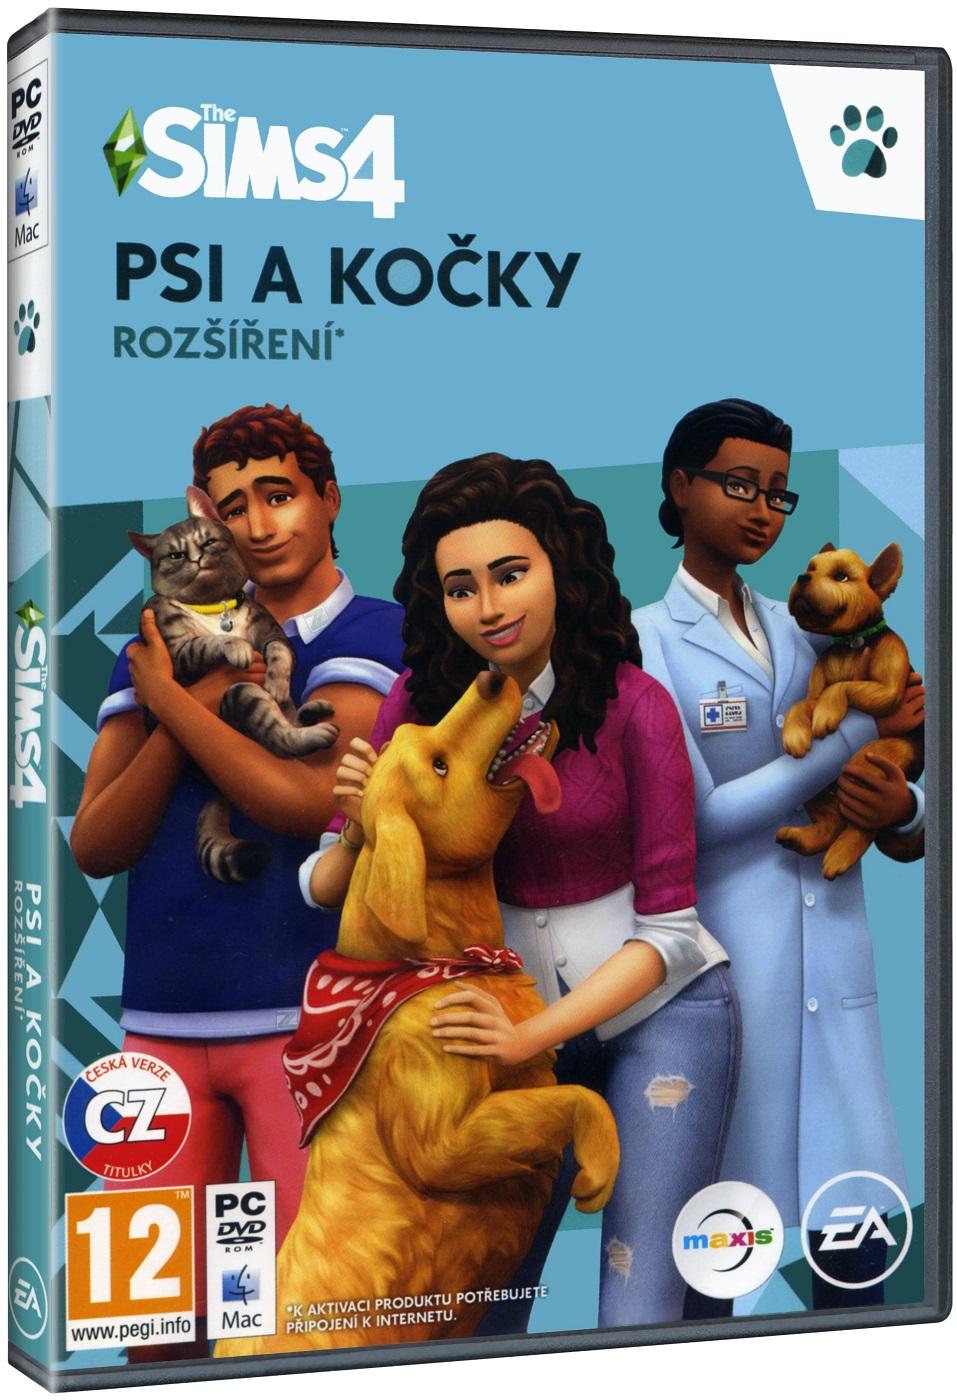 The Sims 4: Psi a kočky - PC